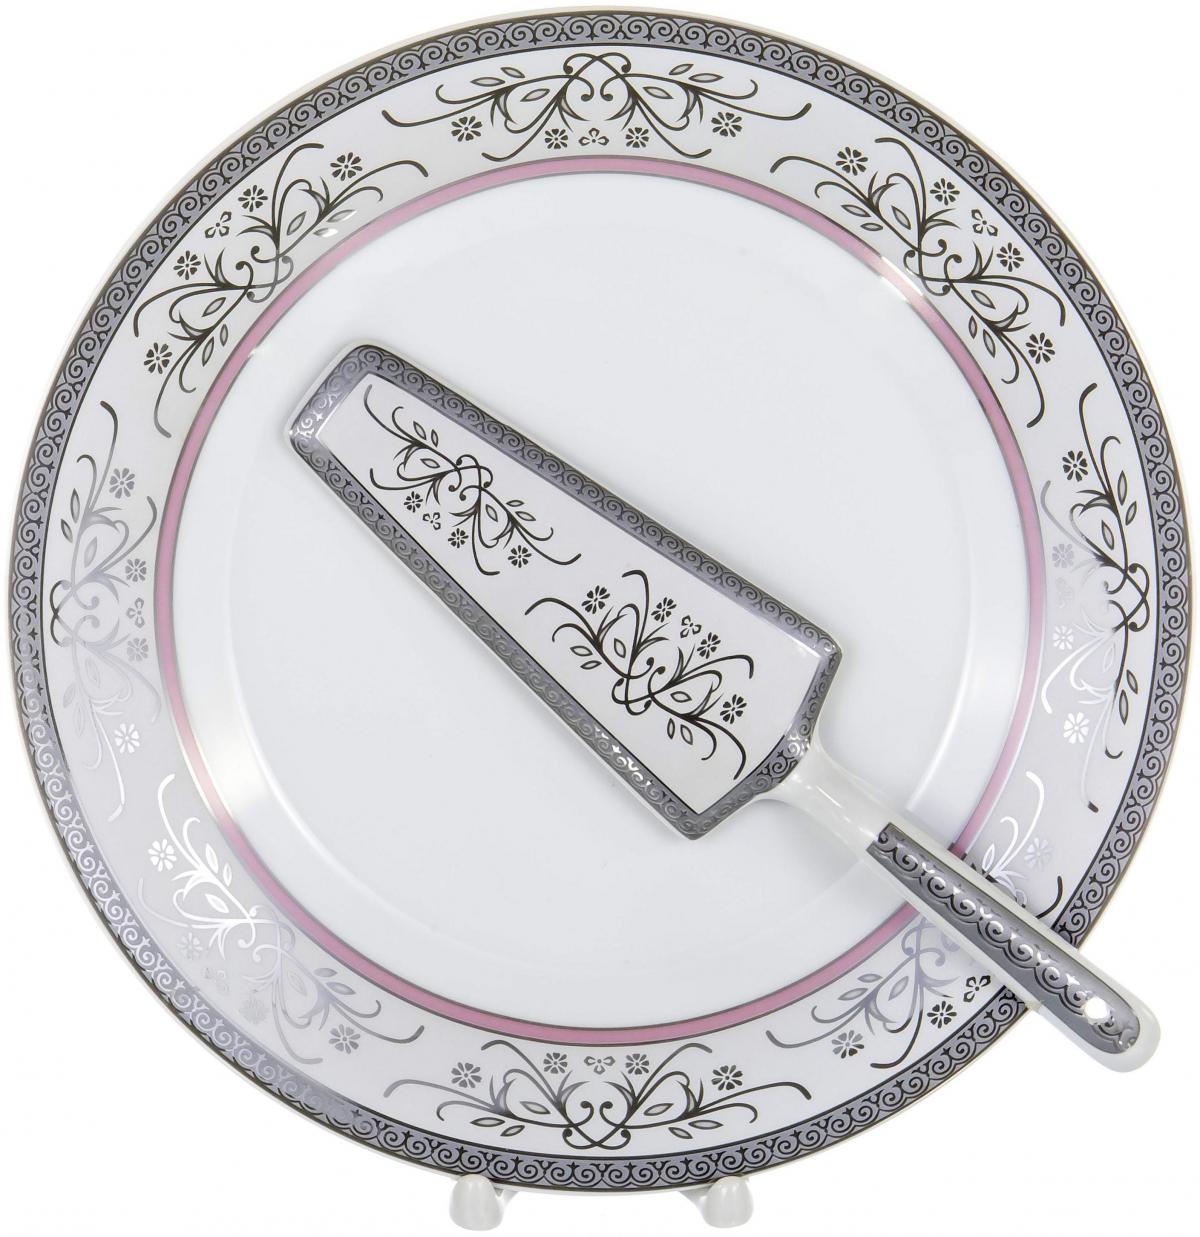 Набор для торта Olaff, 2 предмета. LRS-CPN2-010LRS-CPN2-010CAKE 2, набор д/торта (2) блюдо 255мм + лопатка, декор - золото-серебро, подарочная упаковка